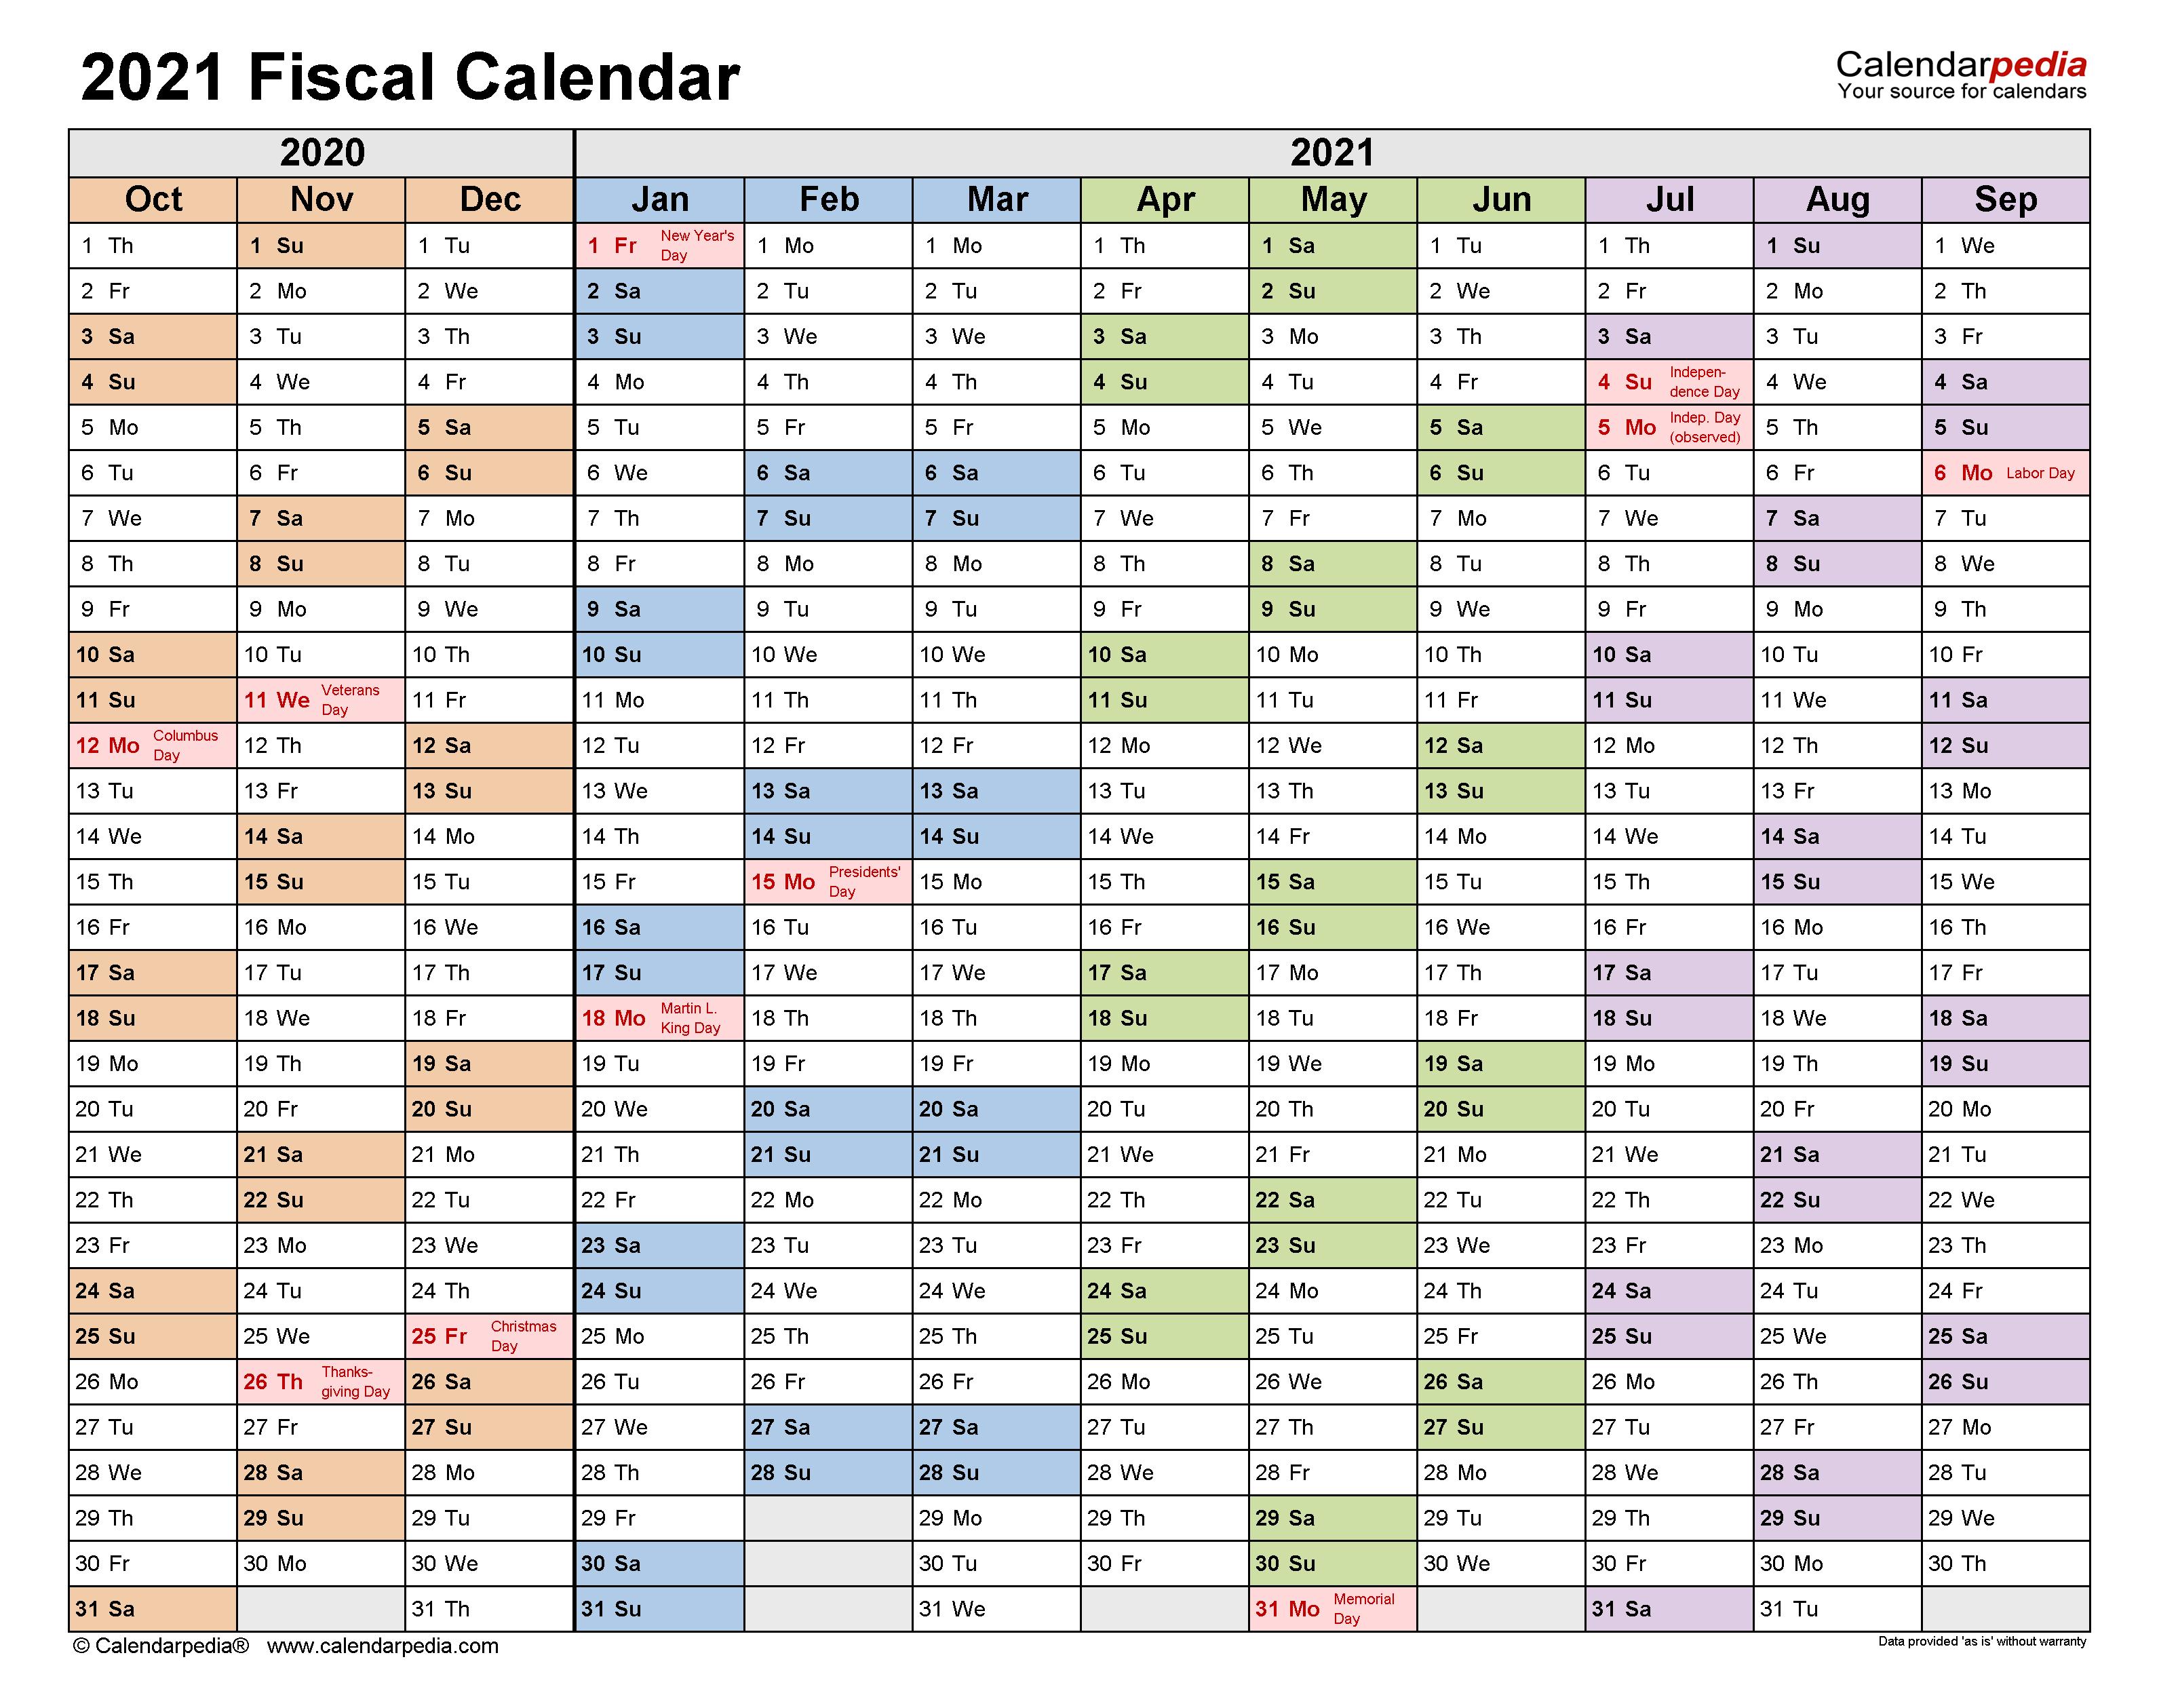 Fiscal Calendars 2021 - Free Printable Pdf Templates with regard to Ficical Calander 4,4,5